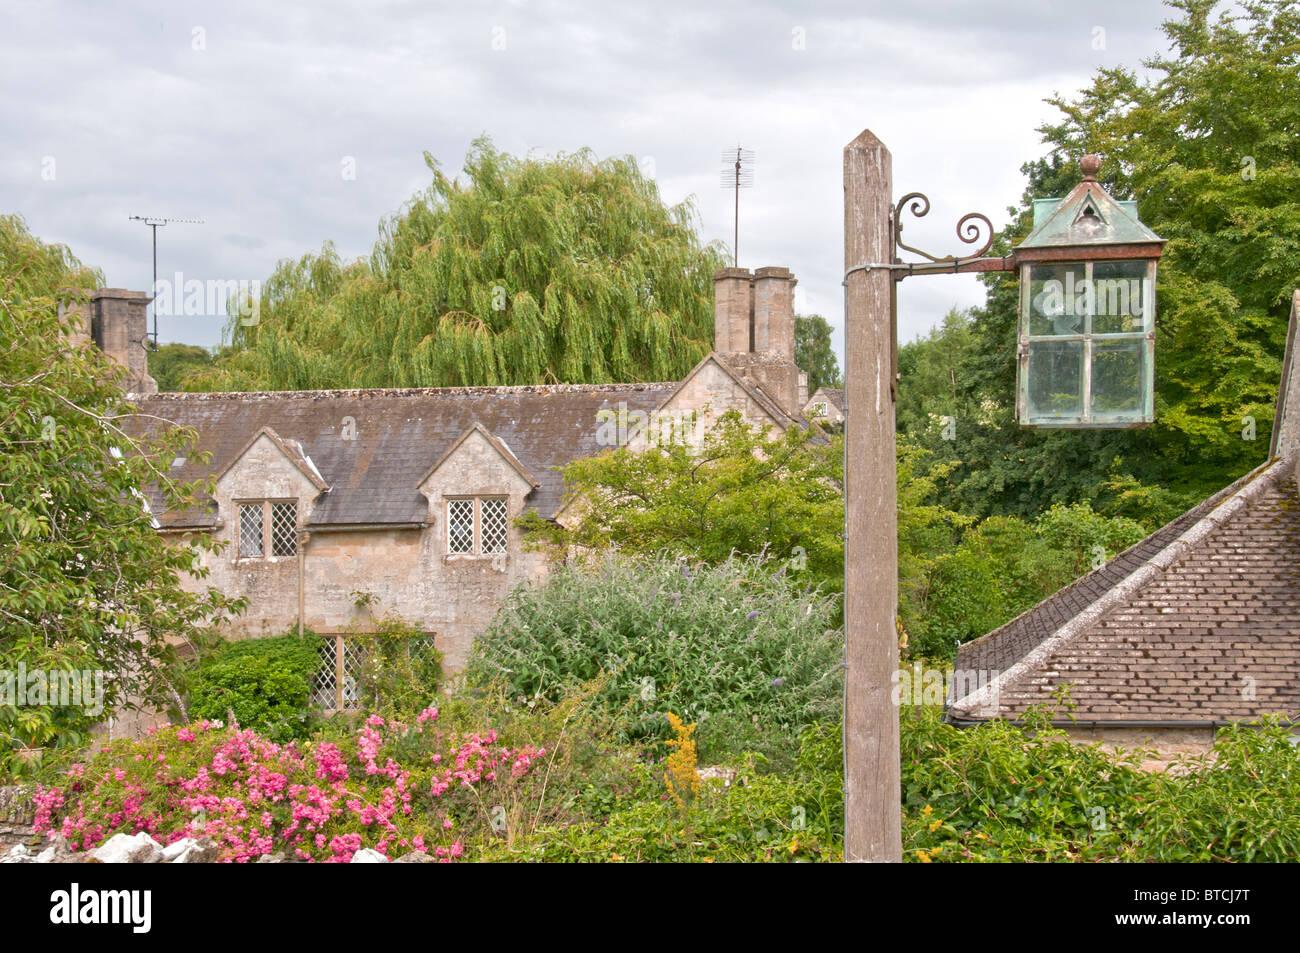 Idyllic scene in the village of Swinbrook; idyllische Szene im Dorf Swinbrook Stock Photo